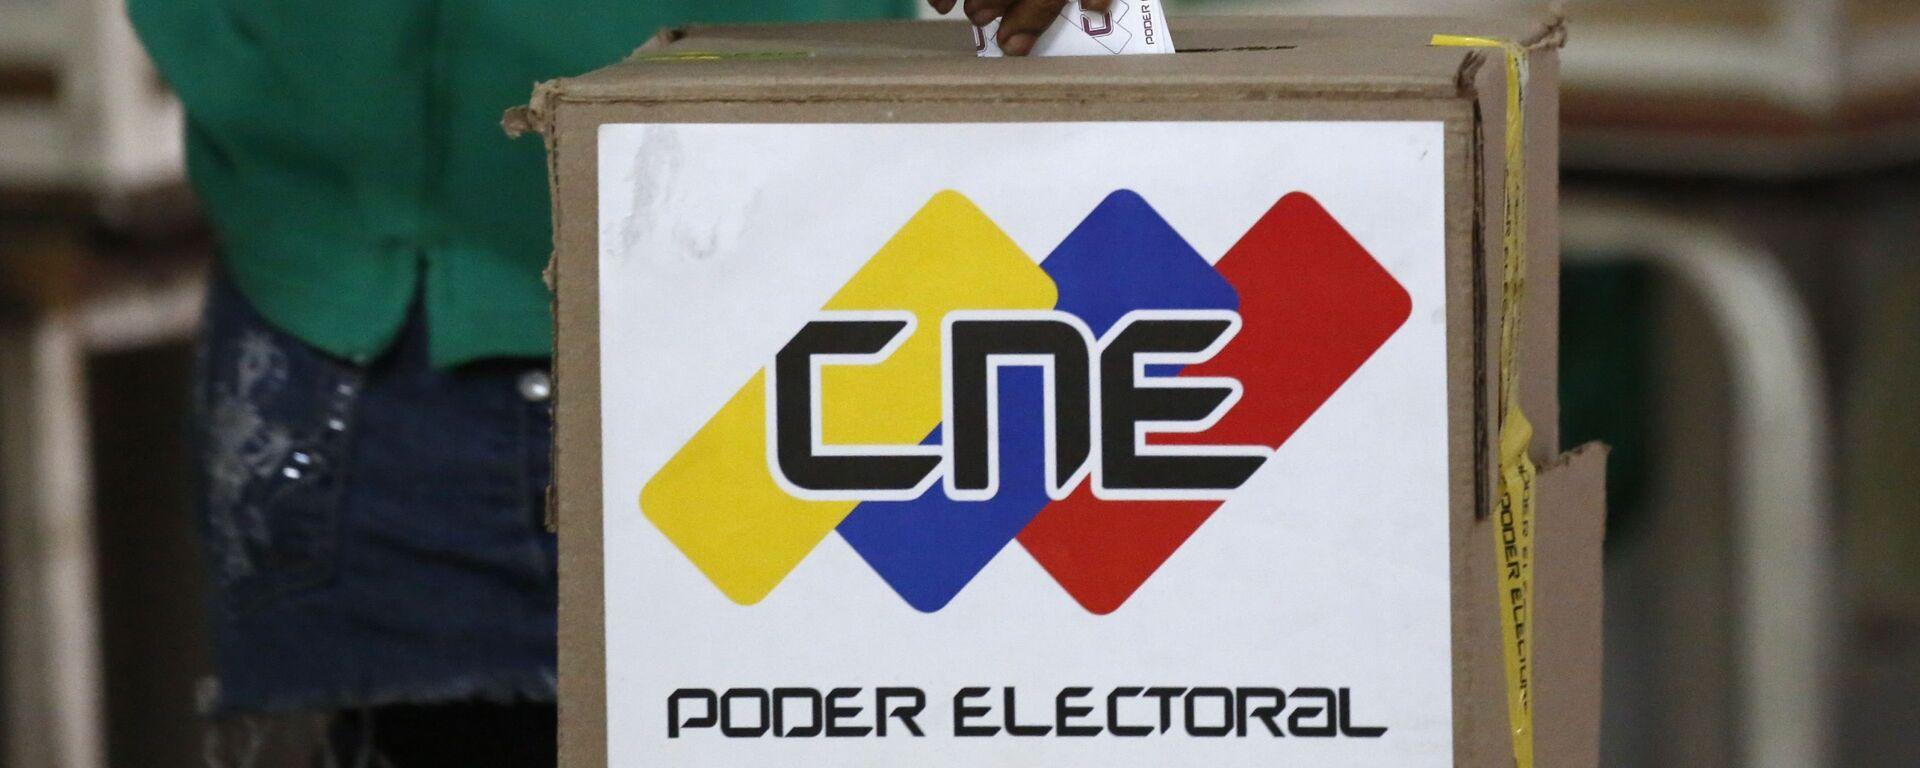 A voter casts a ballot during the Constituent Assembly election in Caracas, Venezuela - Sputnik Mundo, 1920, 18.03.2021